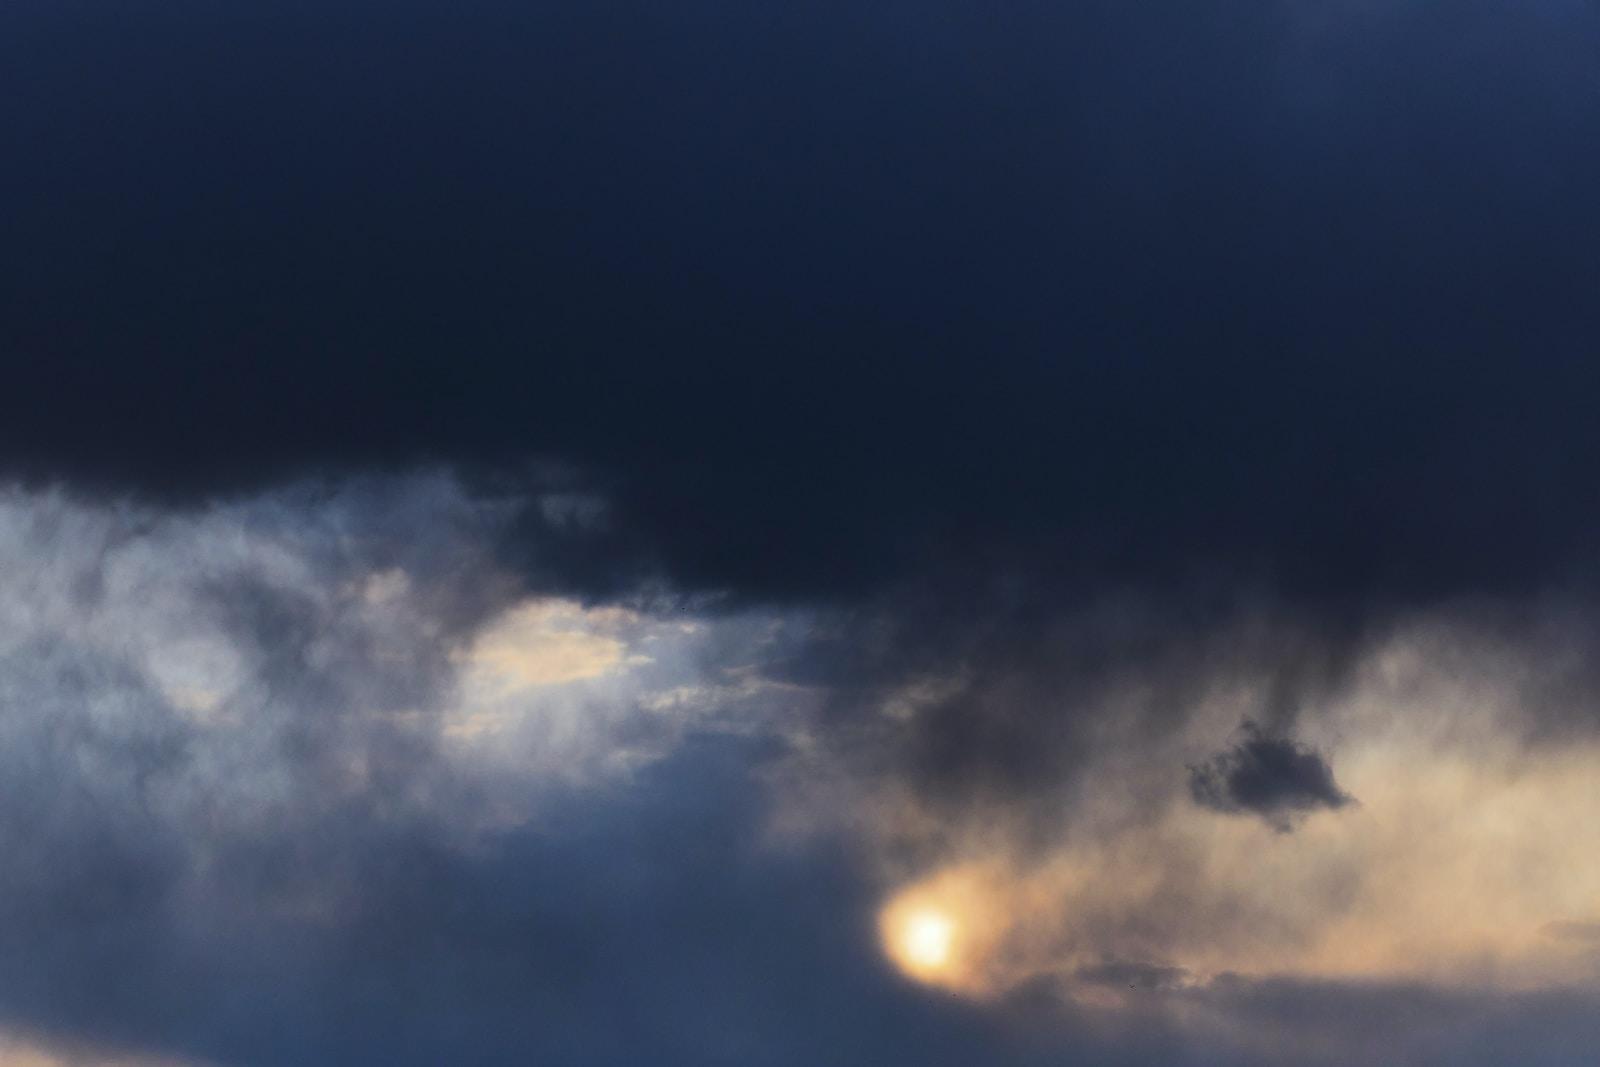 dark sky with white clouds